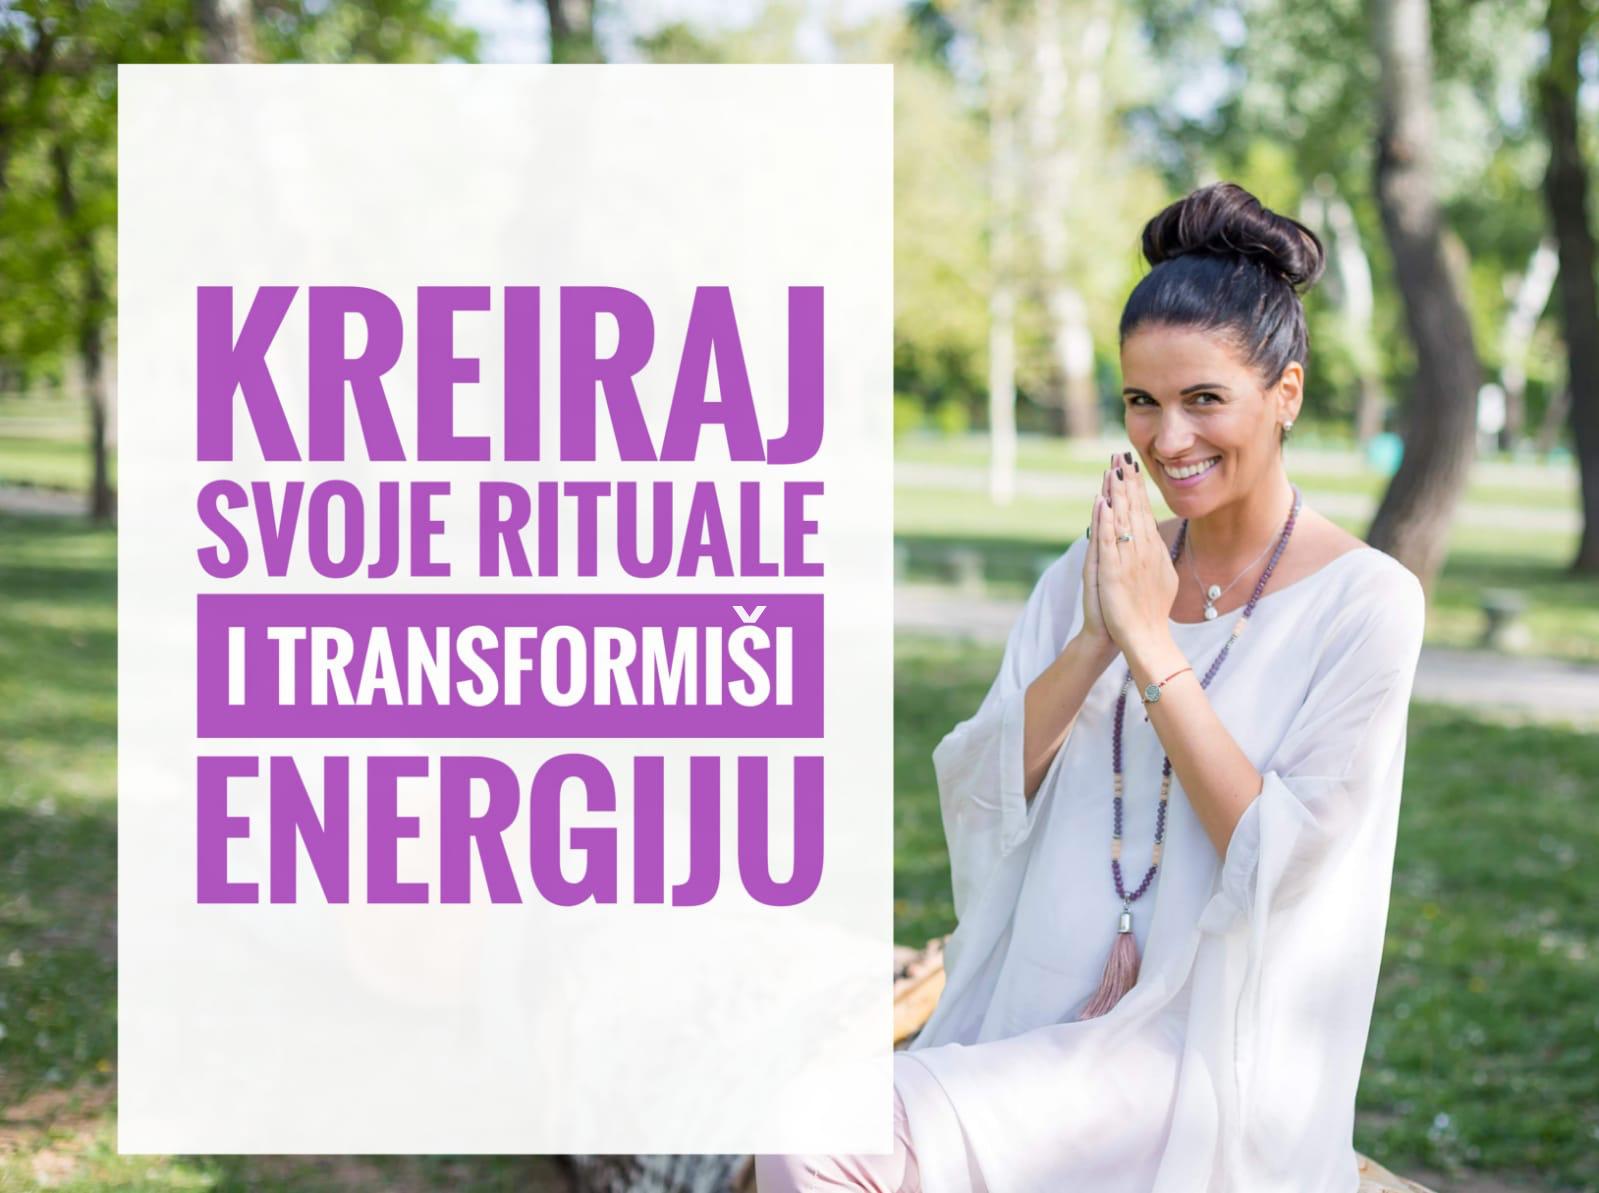 Kreiraj svoje rituale i transformisi energiju